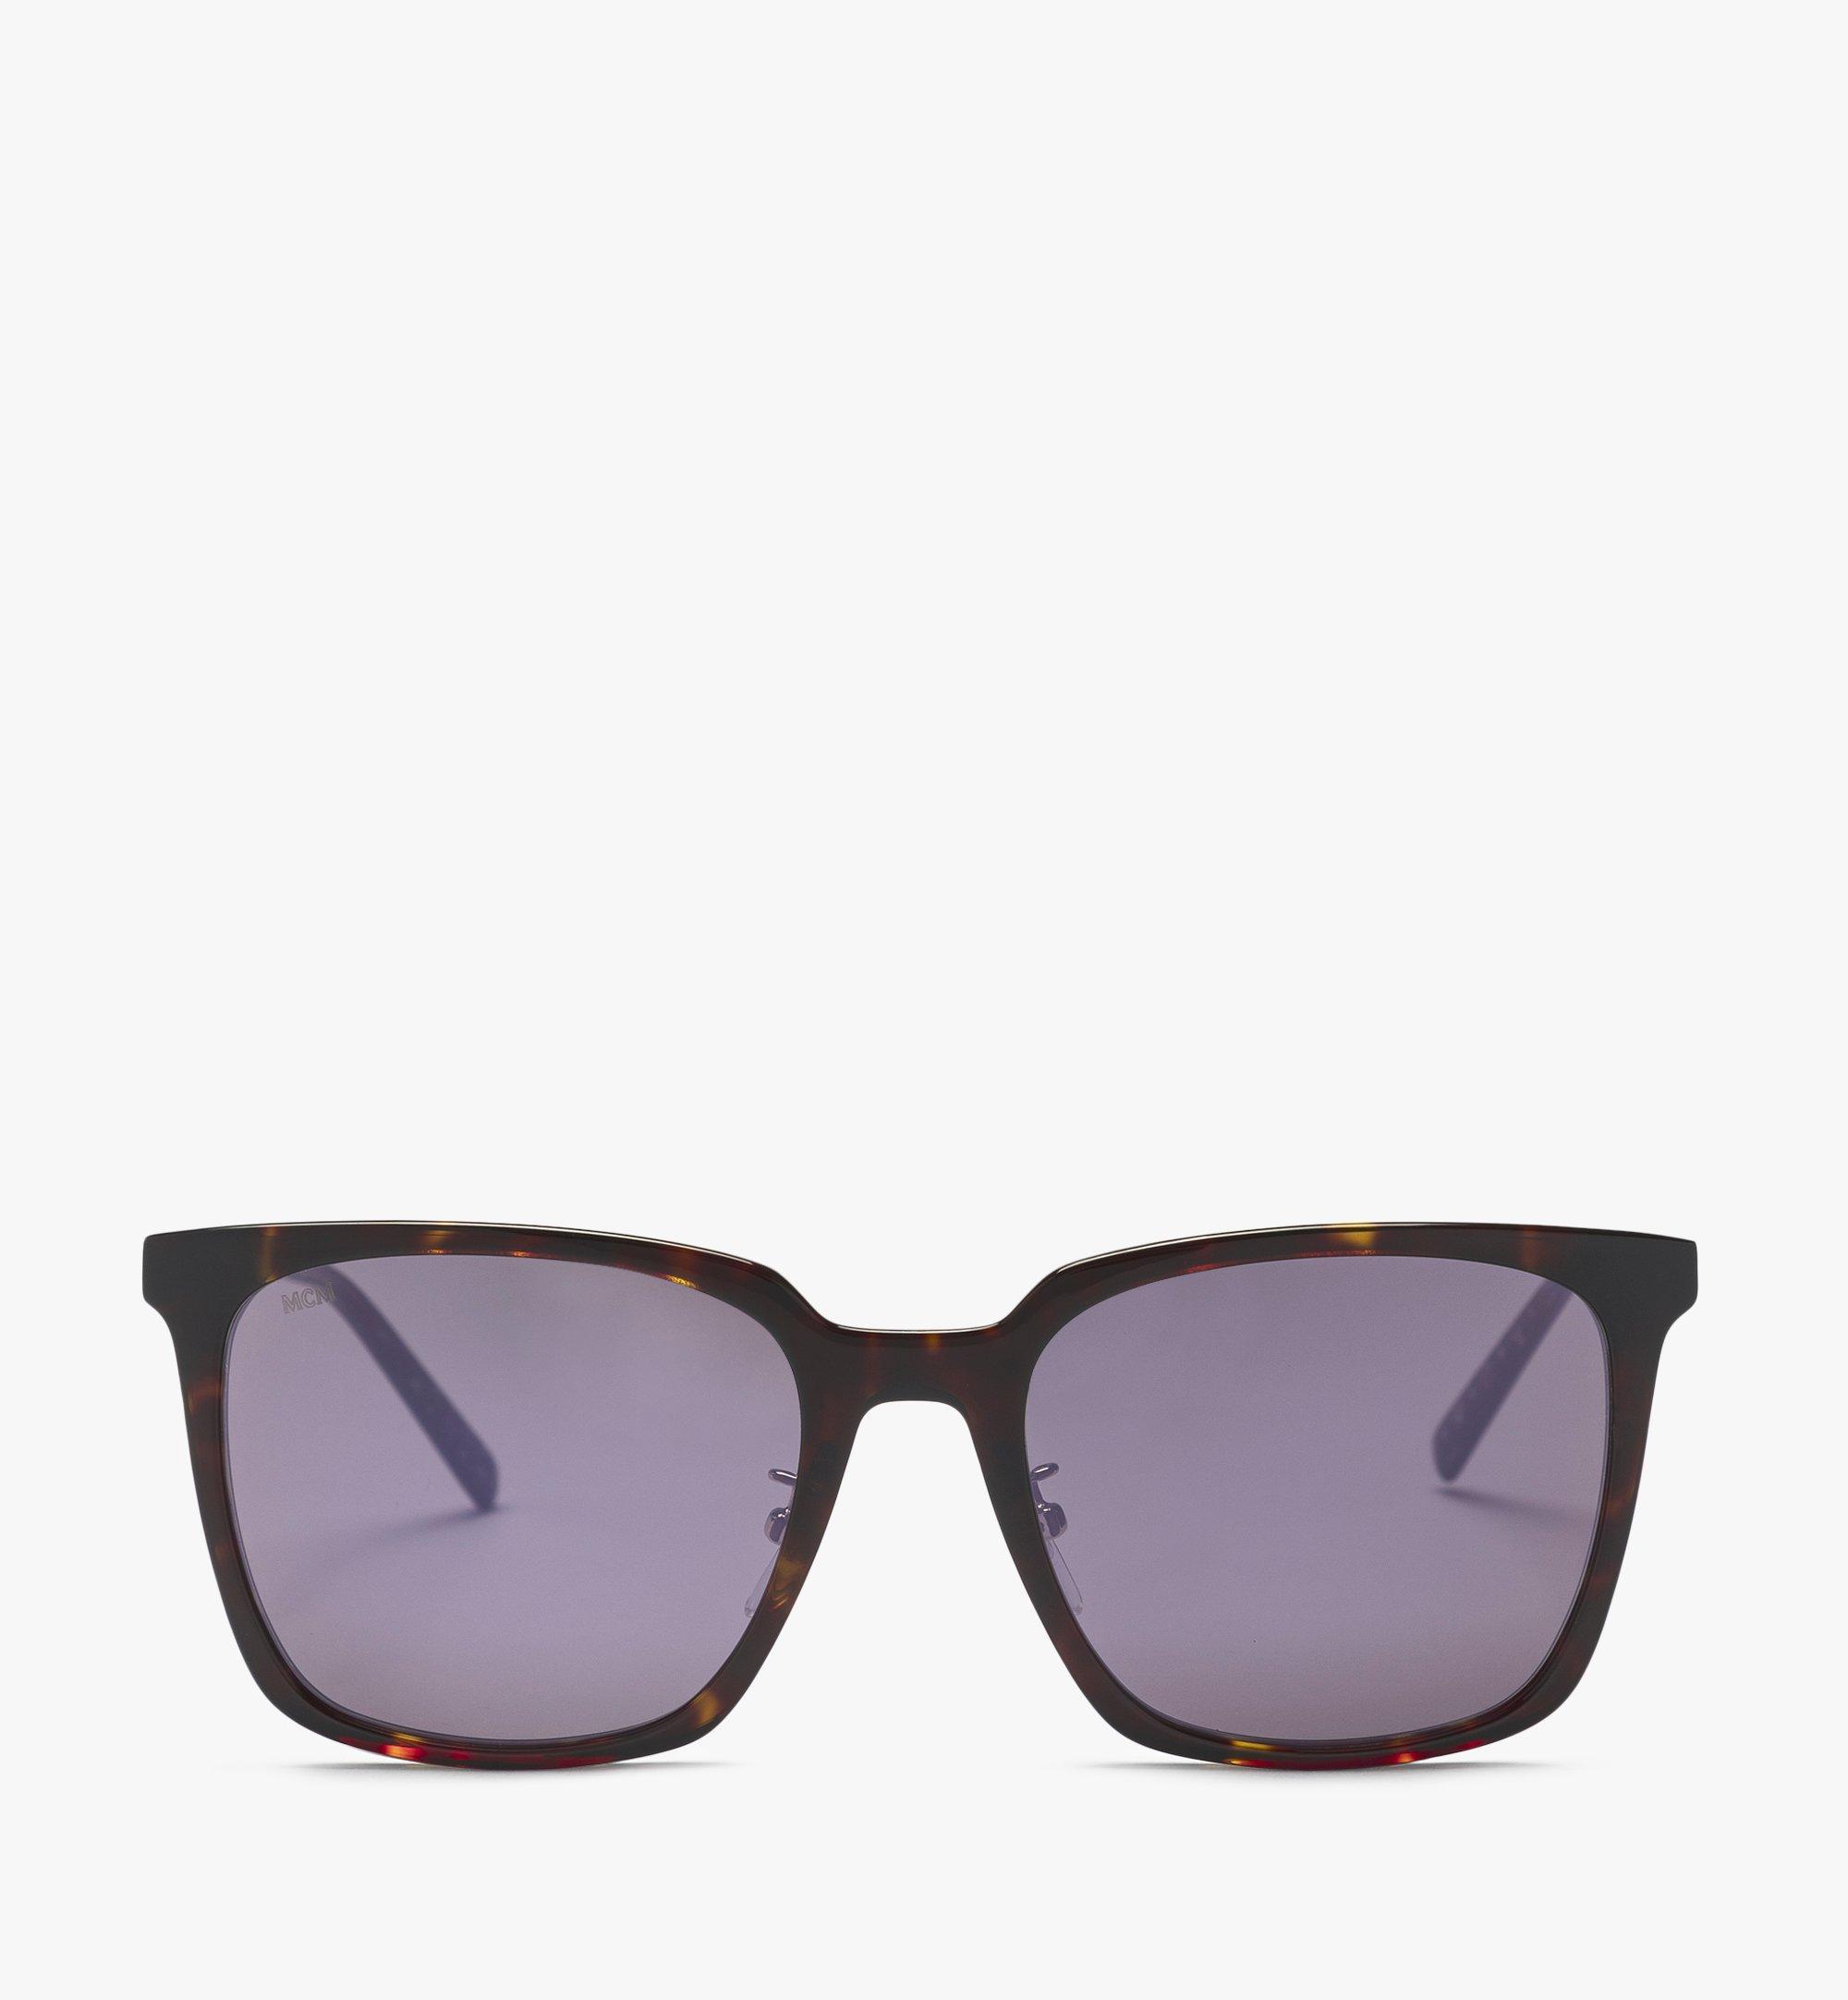 MCM MCM714SA Rectangular Sunglasses Brown MEGBAMM10NQ001 Alternate View 1